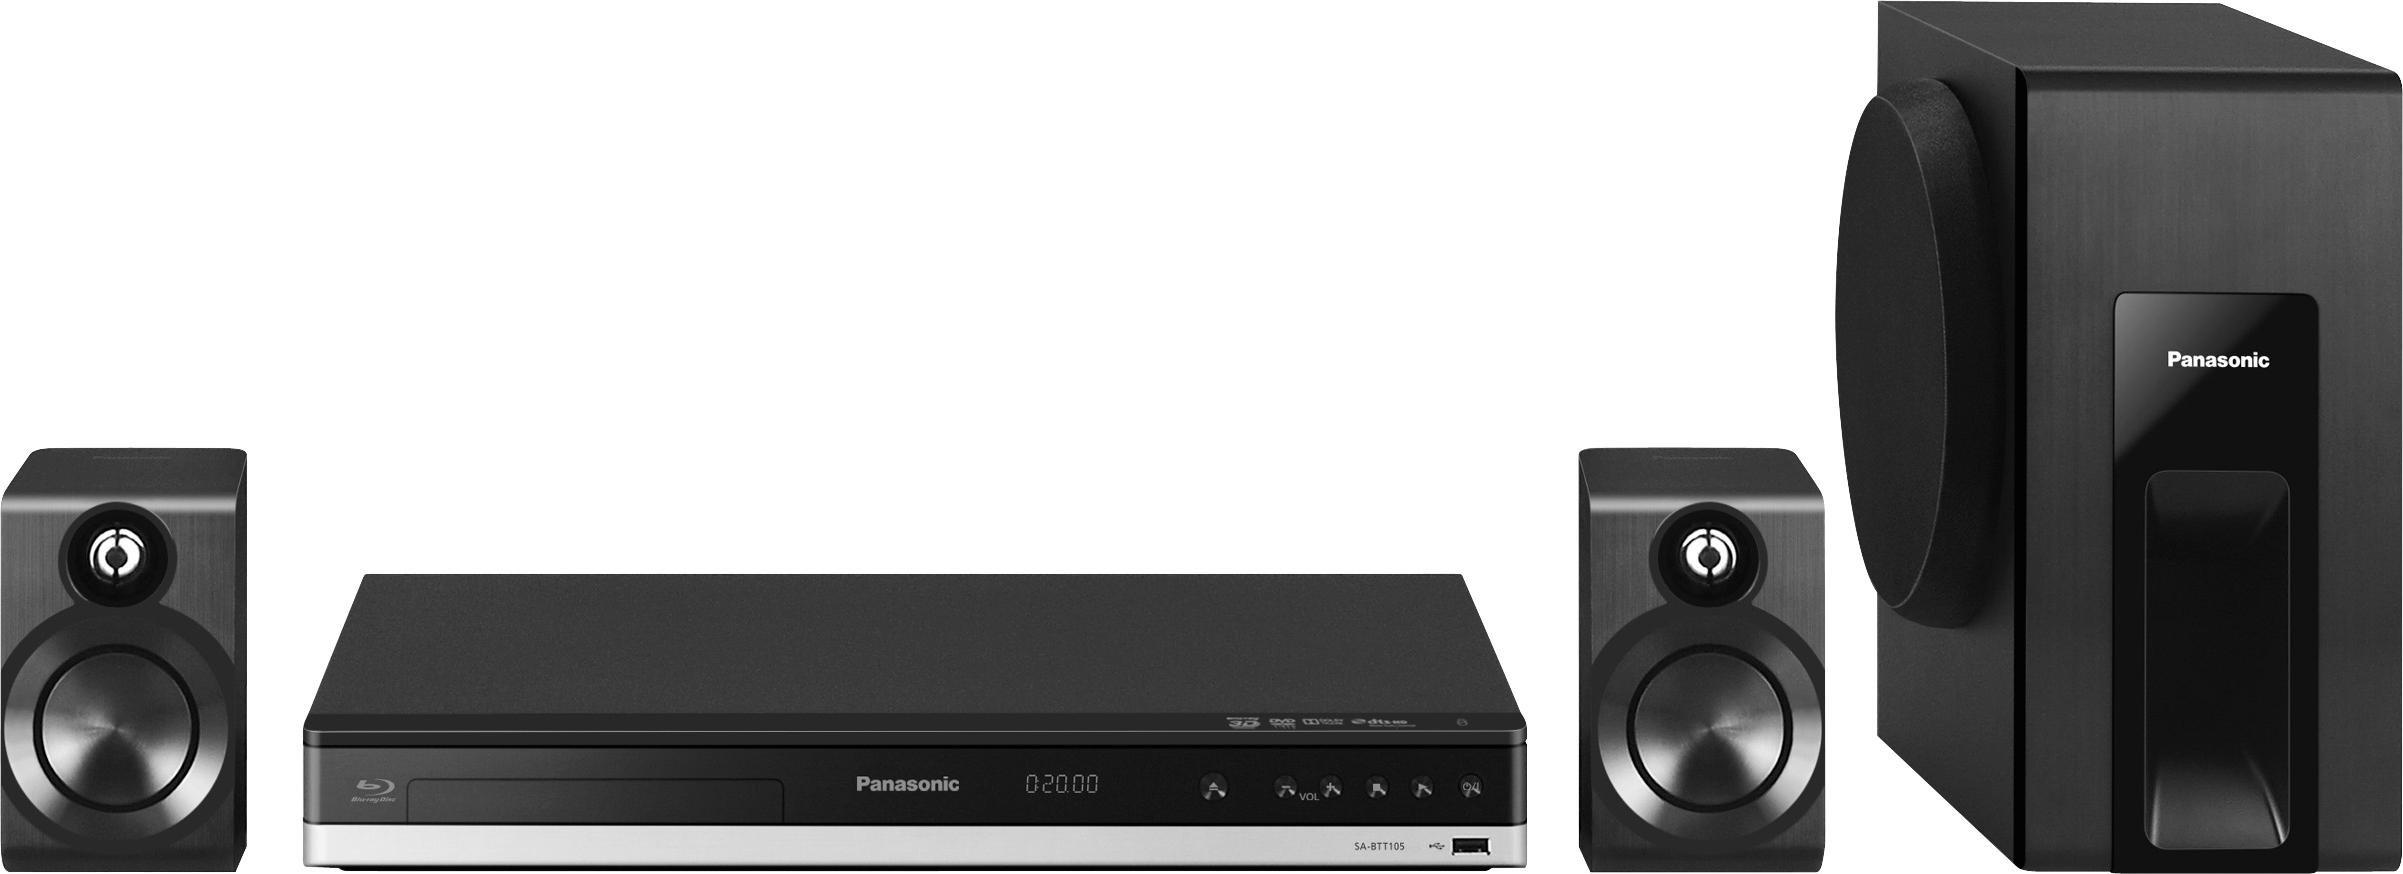 Panasonic »SC-BTT105« 2.1-thuisbioscoop (3D-blu-rayspeler, 300 W, wifi, NFC, bluetooth) nu online kopen bij OTTO